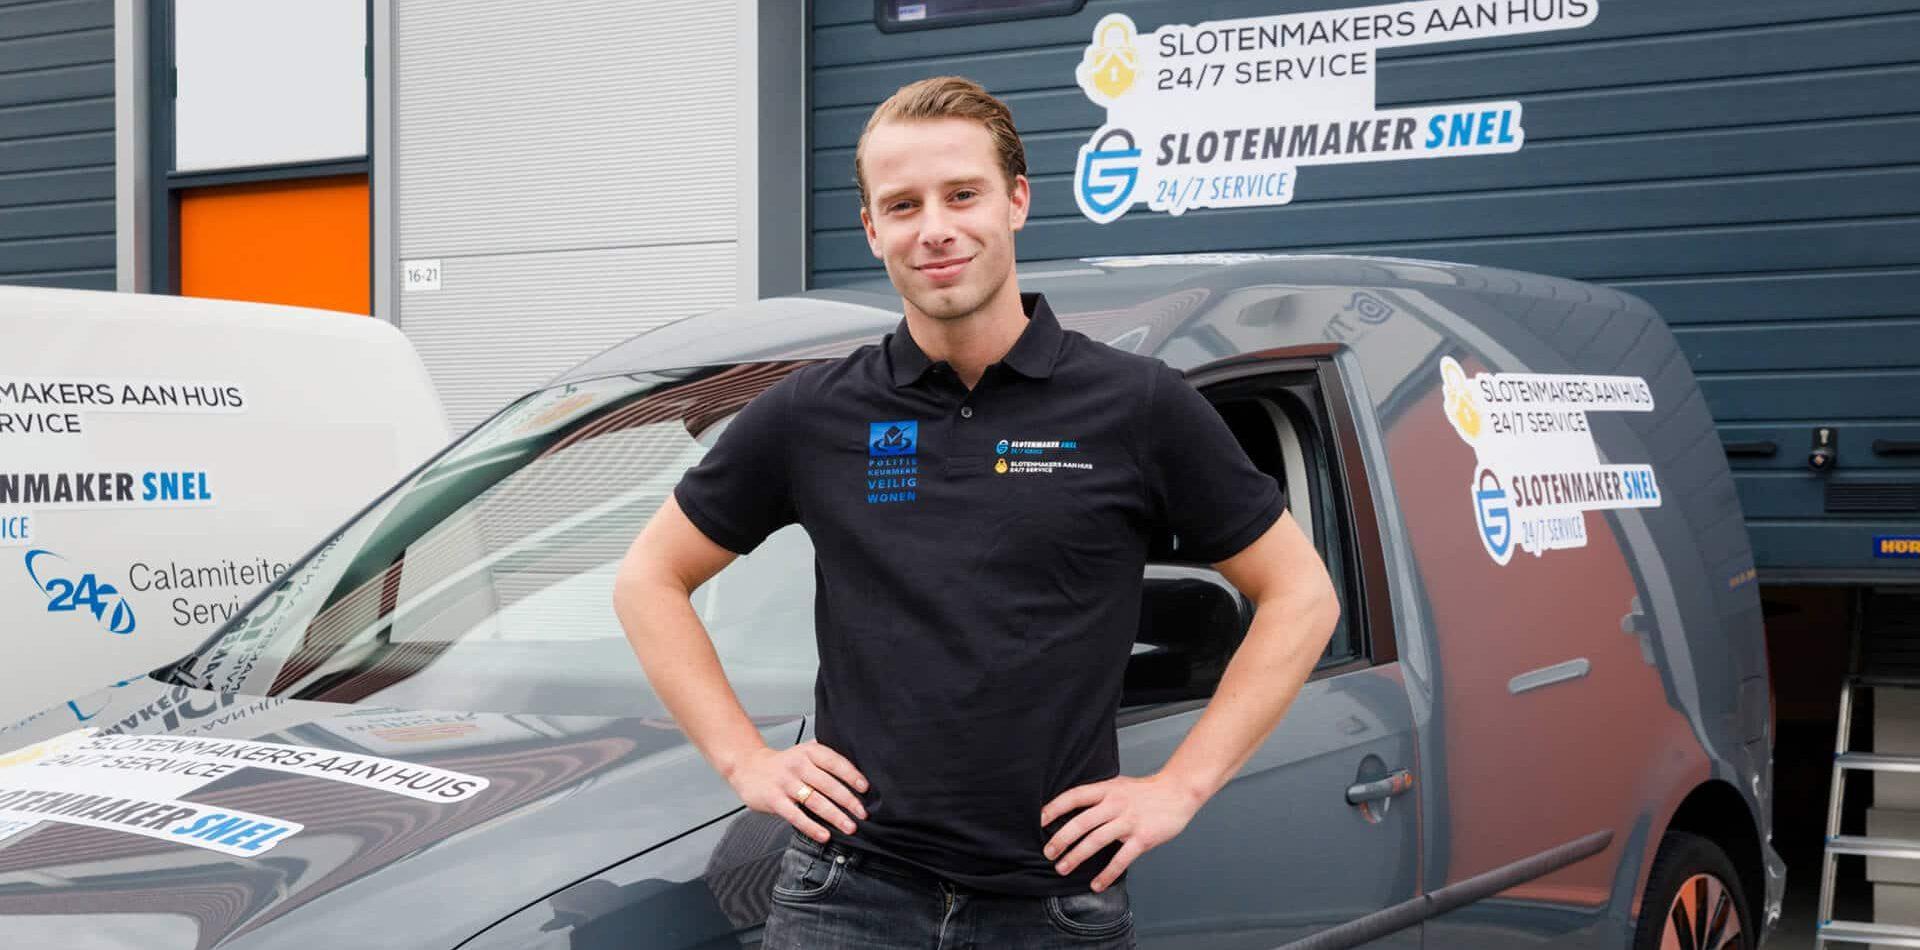 Slotenmaker Scheveningen